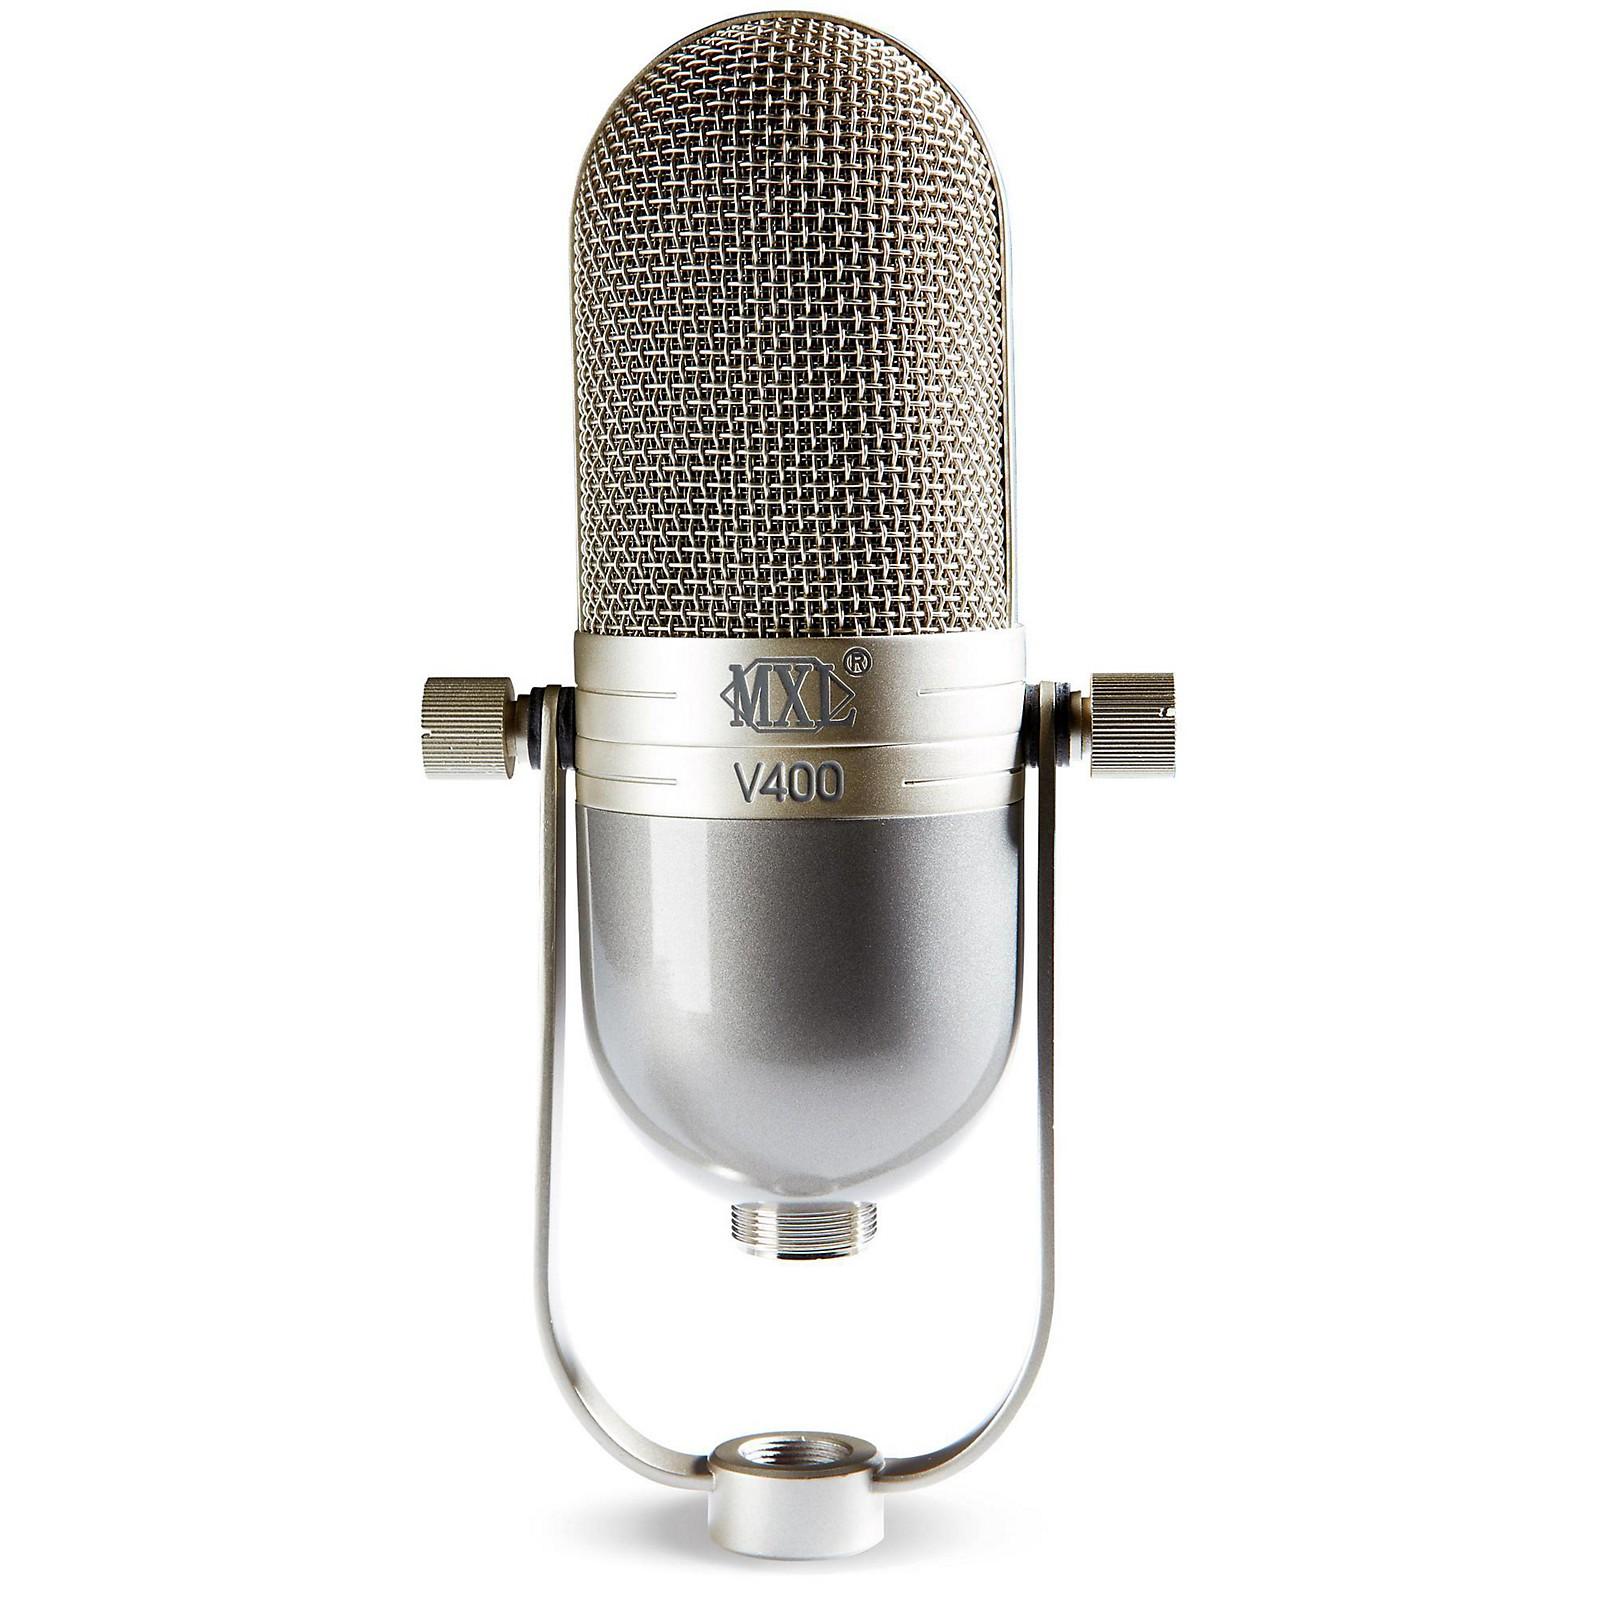 Open Box MXL V400 Dynamic Microphone in a Vintage Style Body